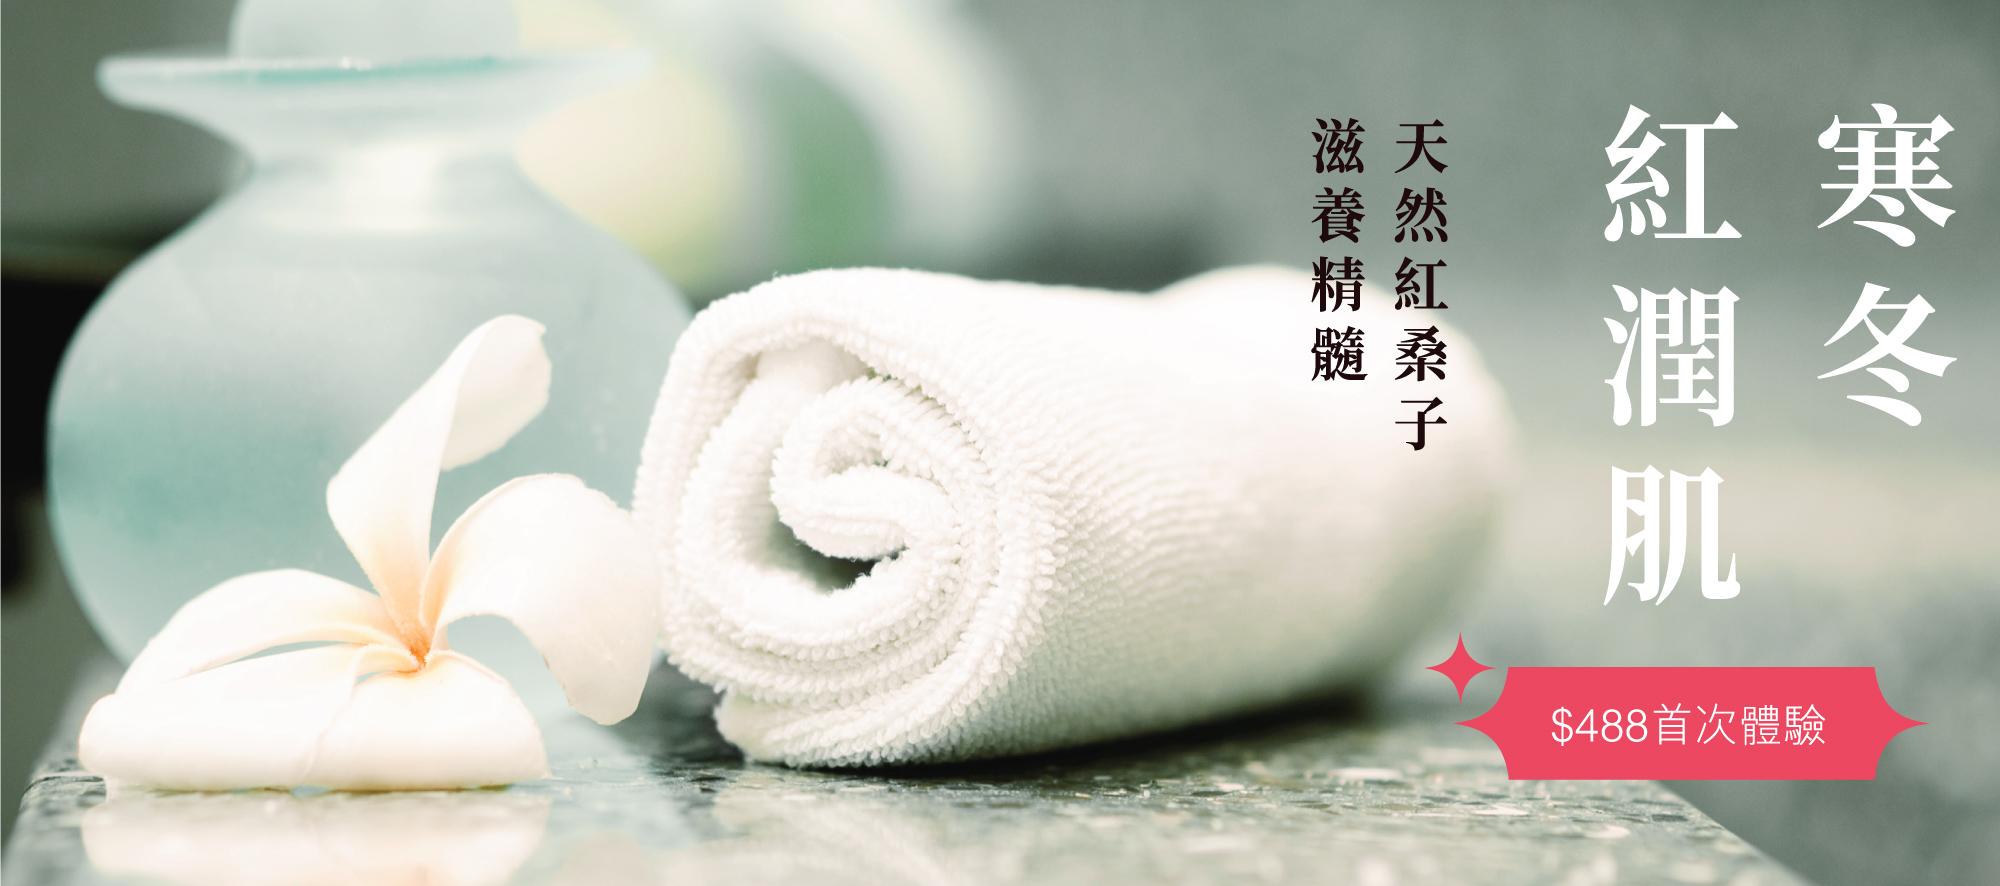 OASIS spa, 秋冬護膚,保濕